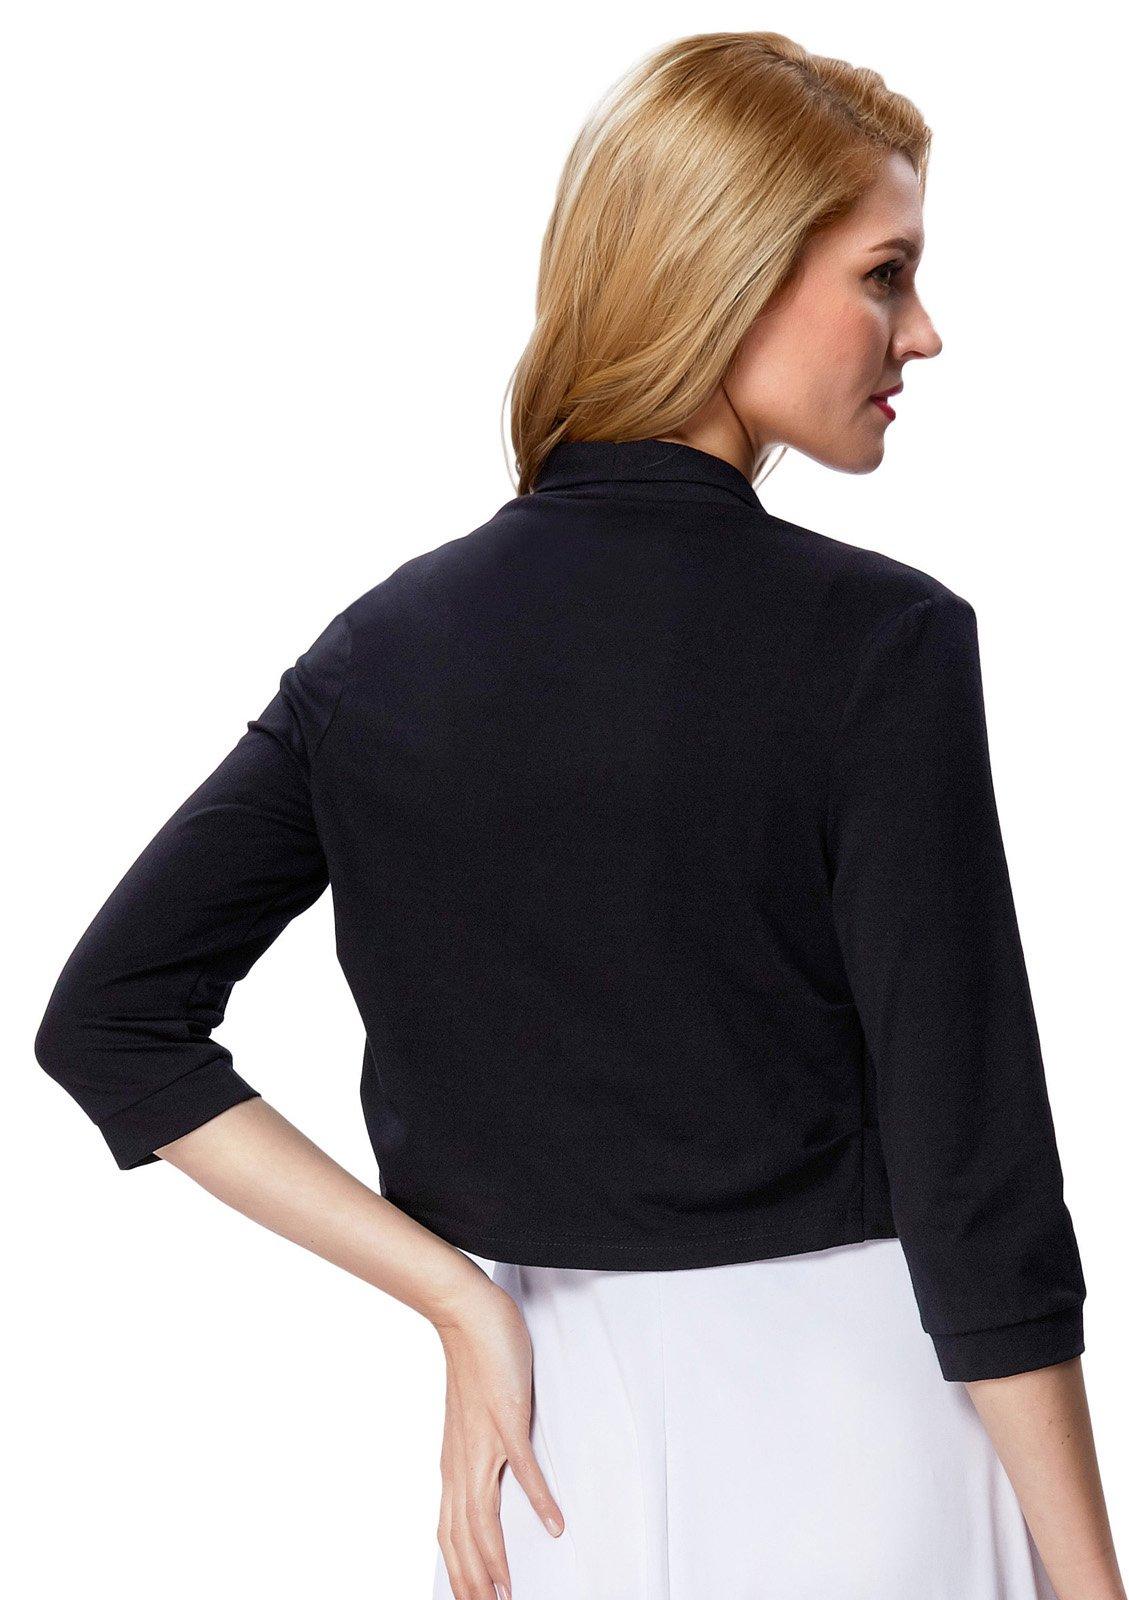 Spring Black Cropped Wedding Bolero Jacket Plain(XL, Black 512-1) by JS Fashion Vintage Dress (Image #2)